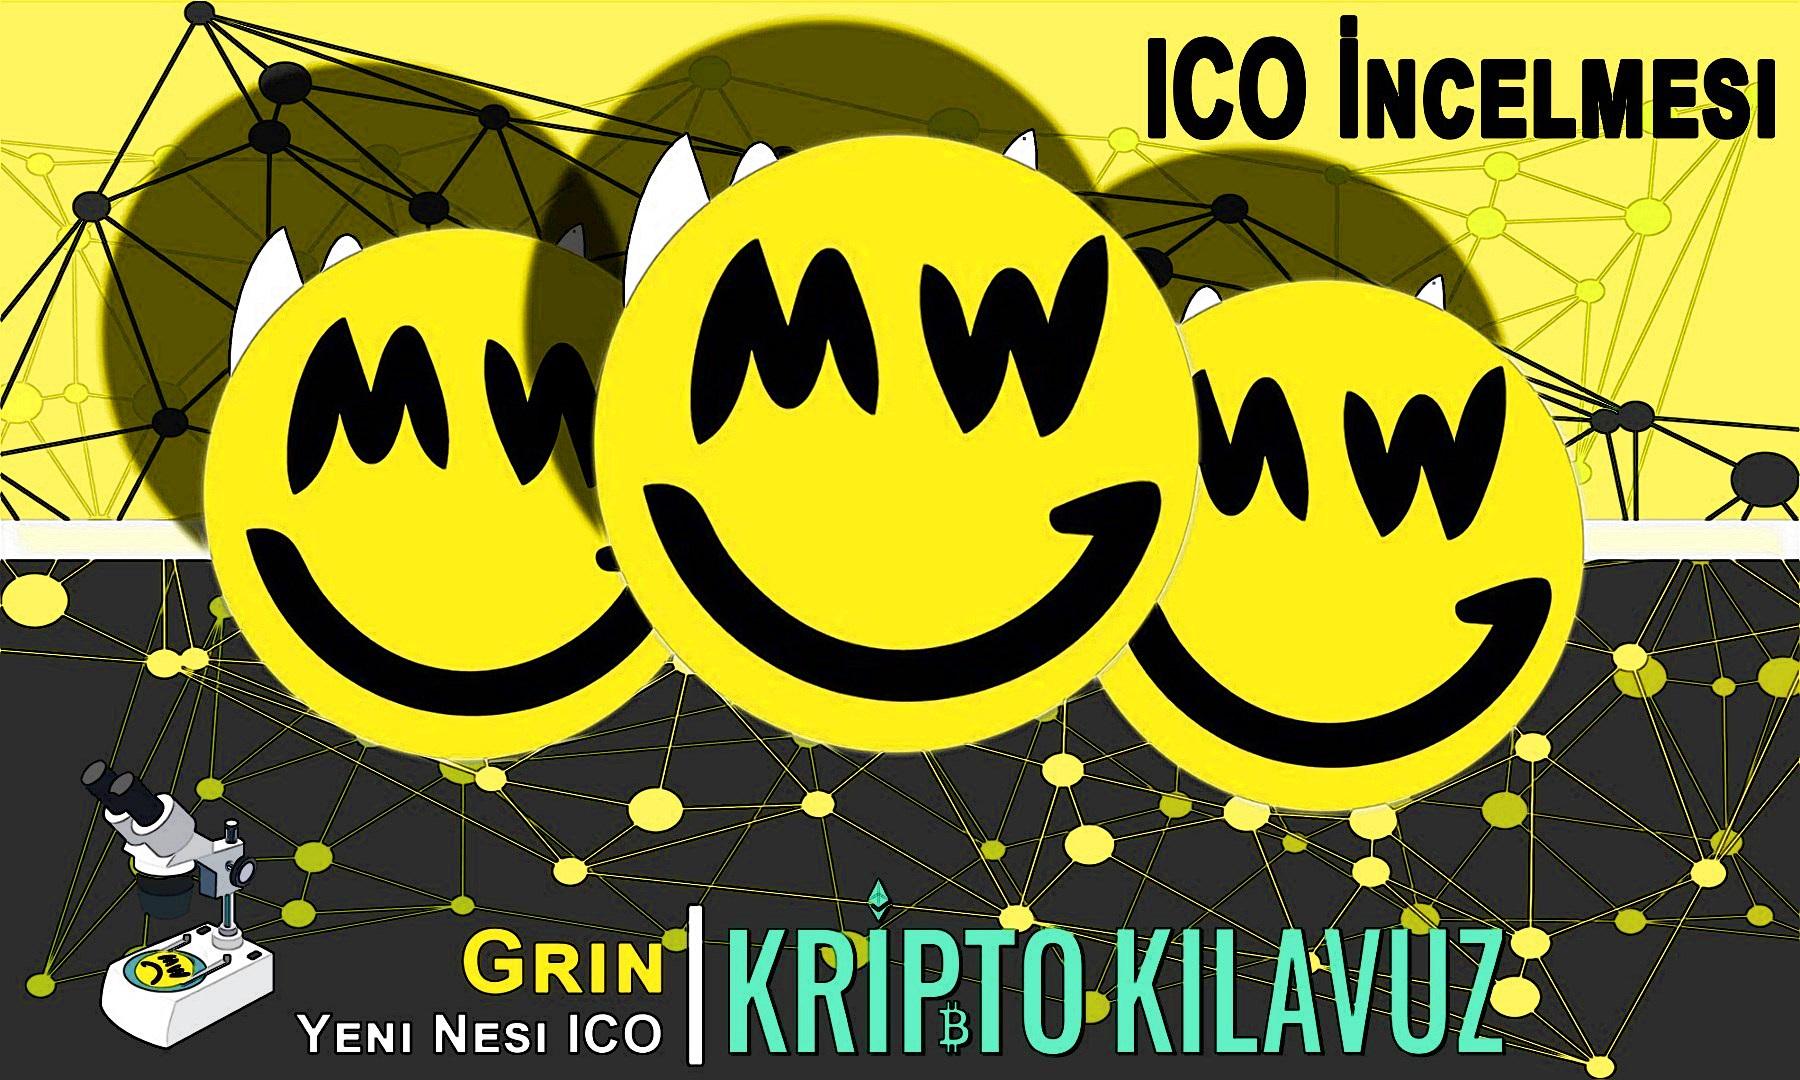 ICO İncelemesi: Grin